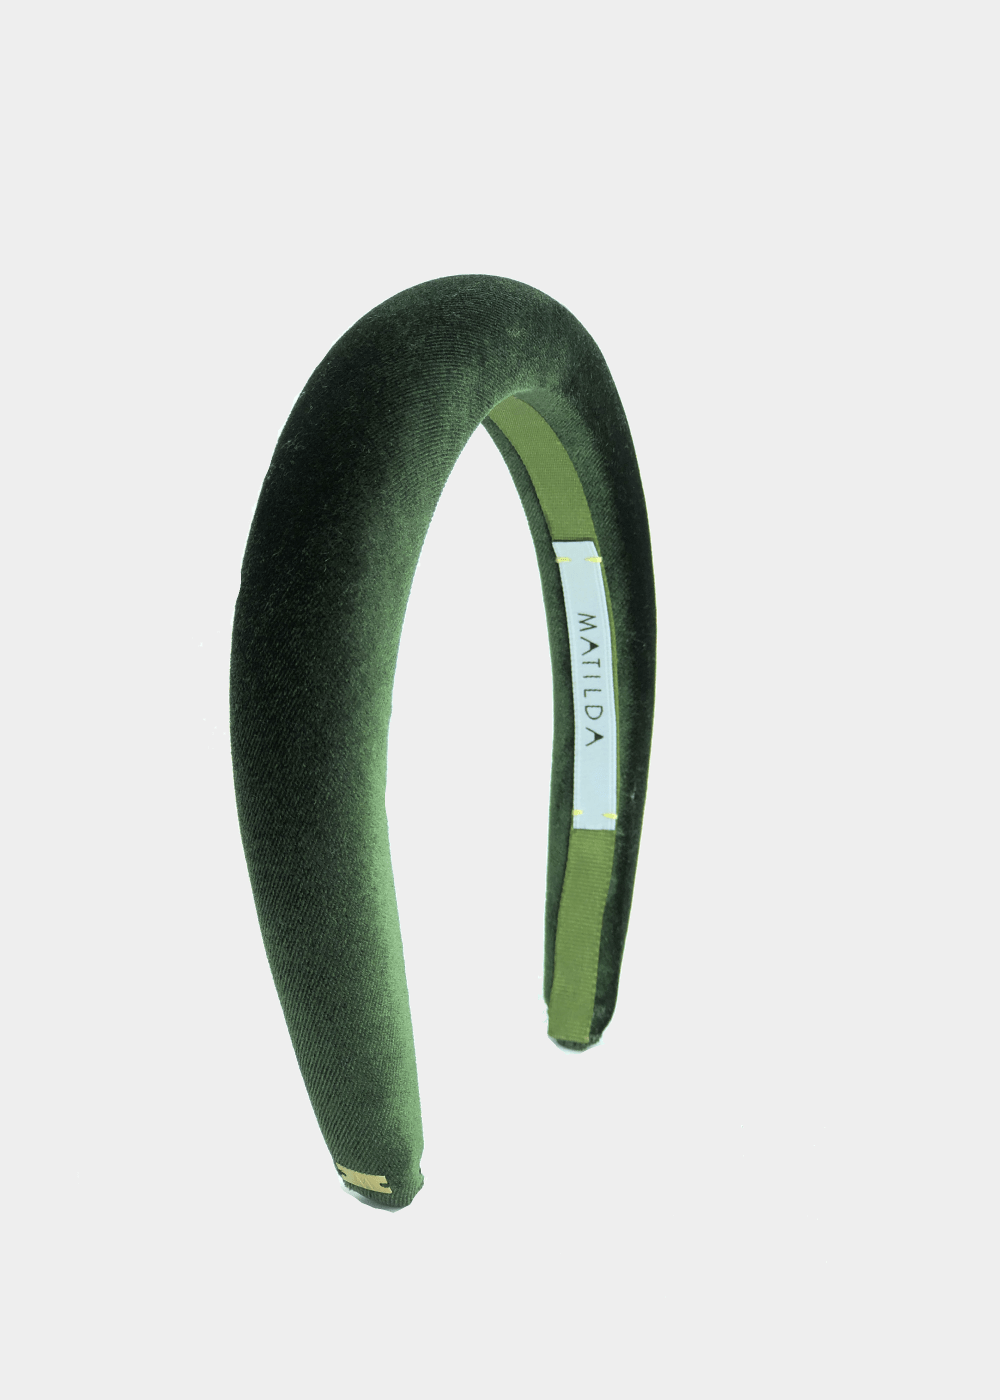 tiarapoppingverdemusgo